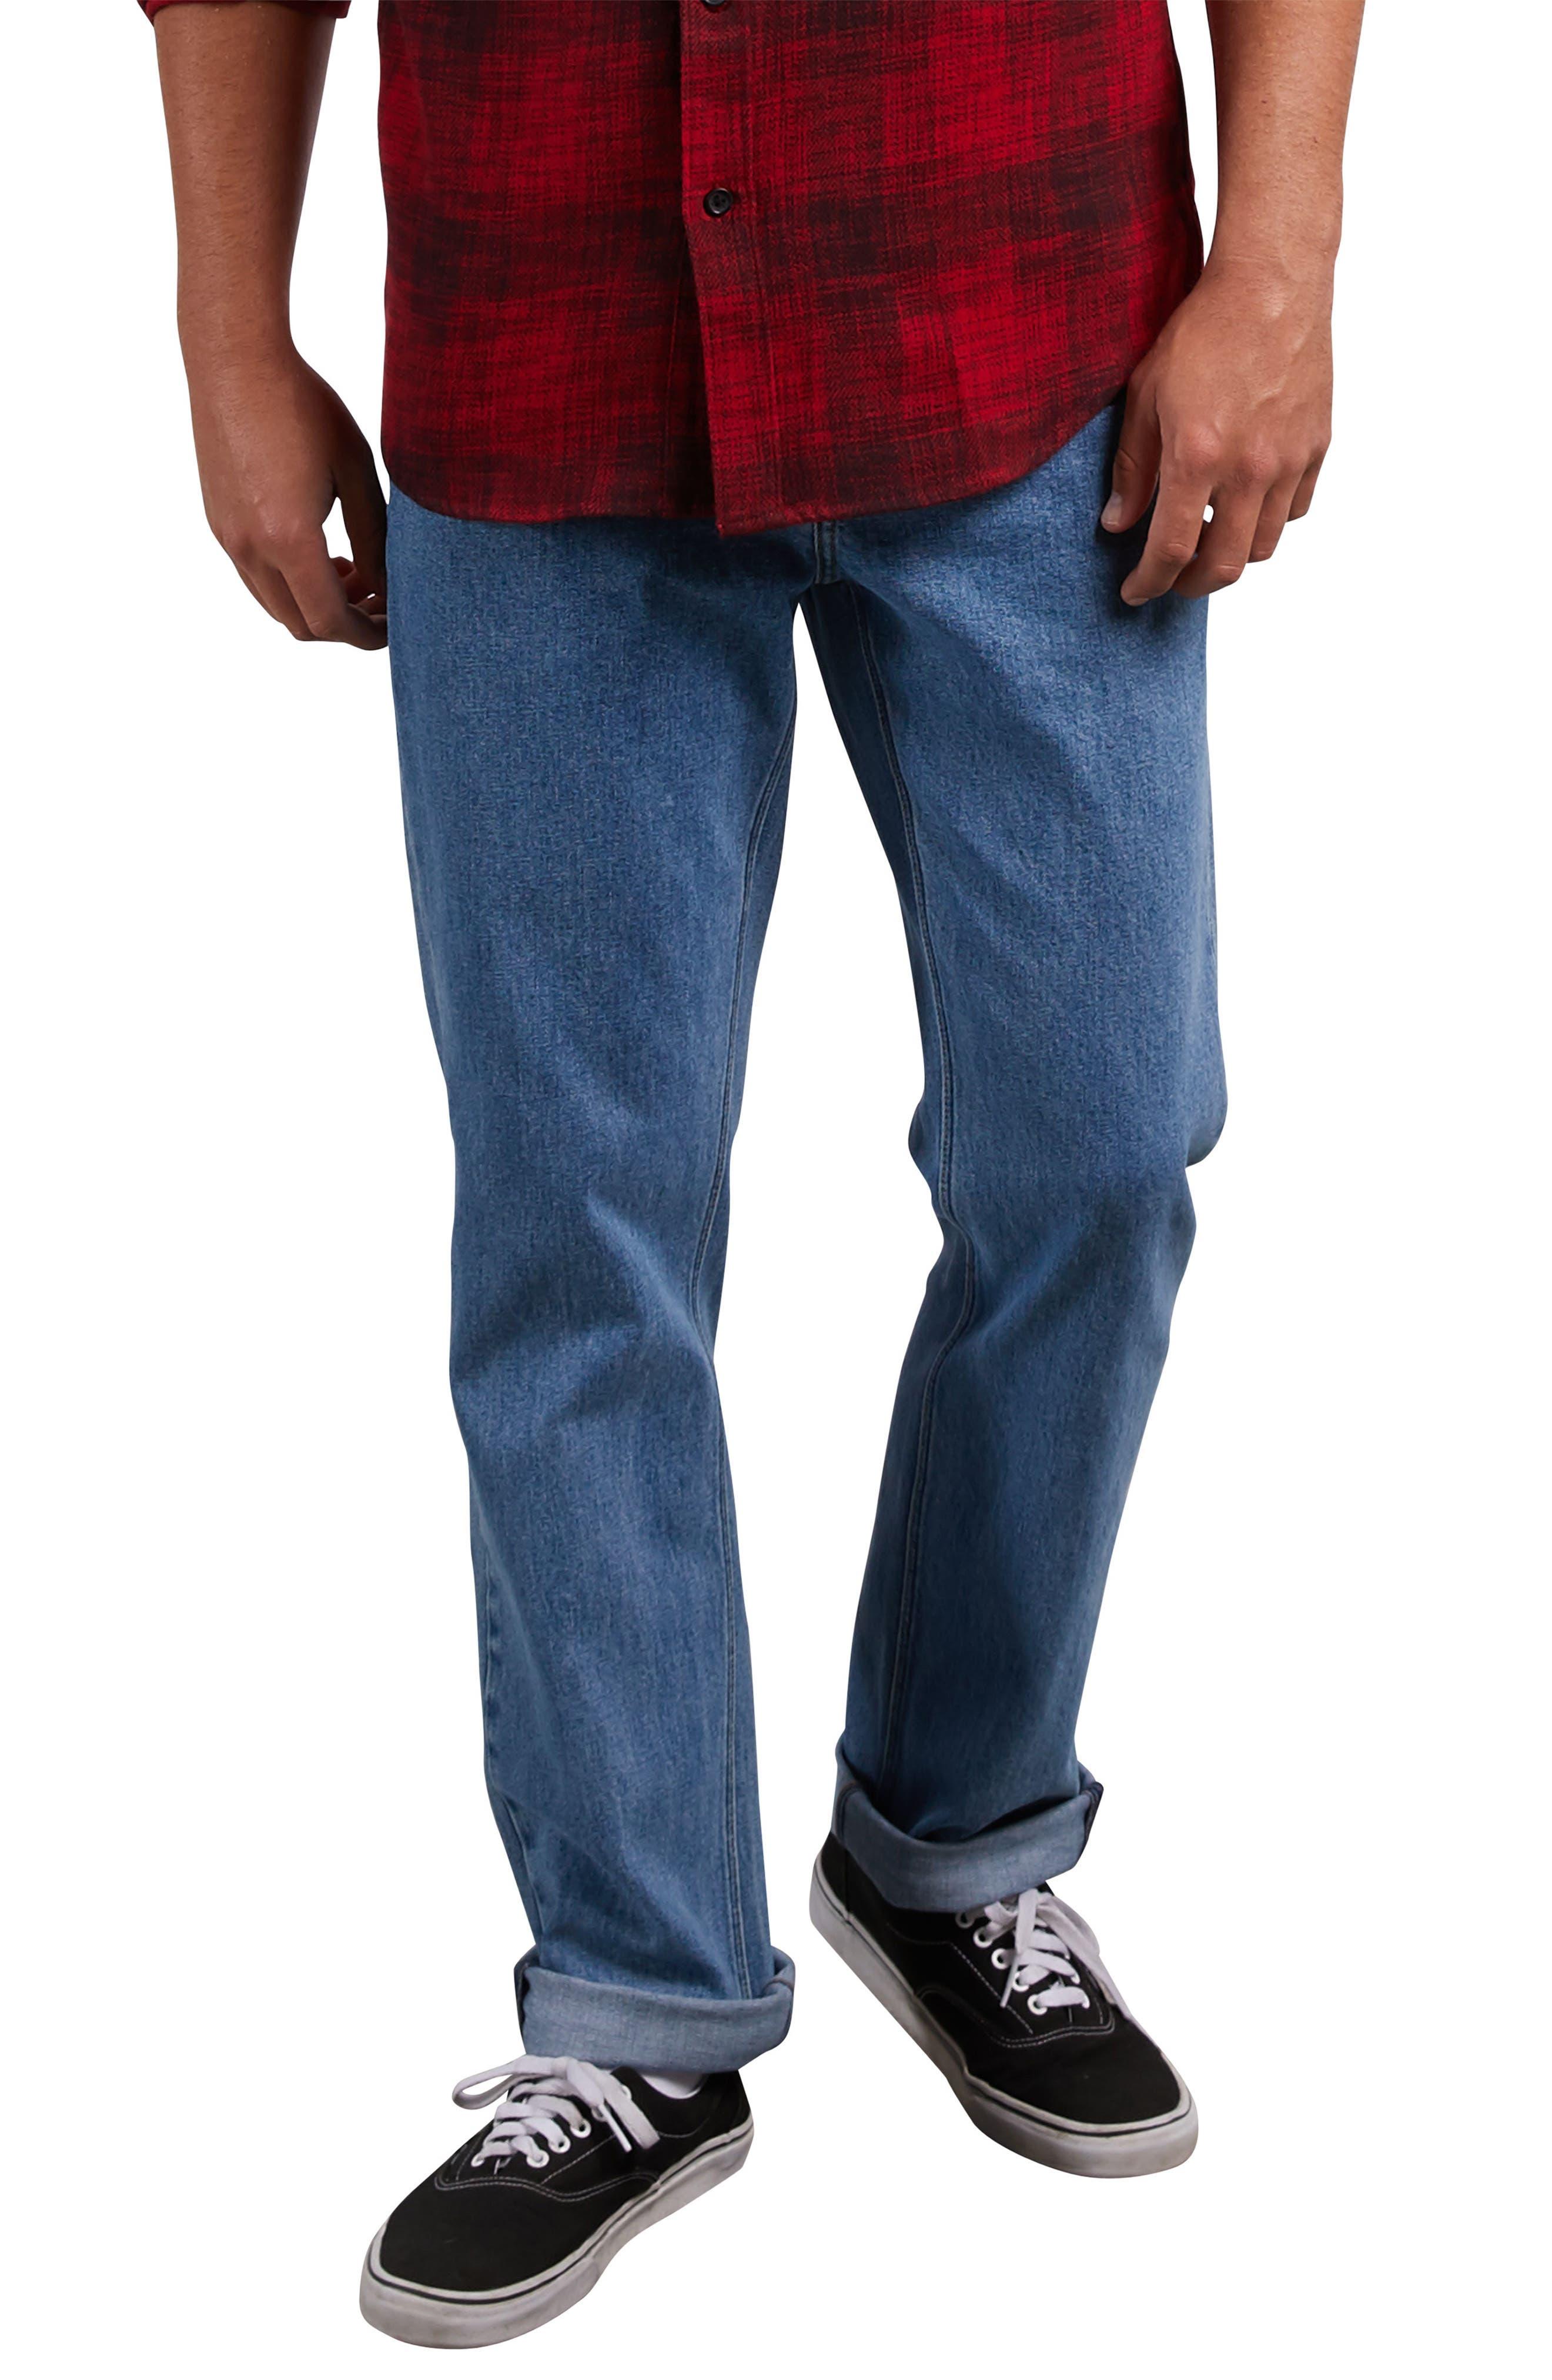 Solver Straight Leg Jeans,                             Main thumbnail 1, color,                             STONE BLUE